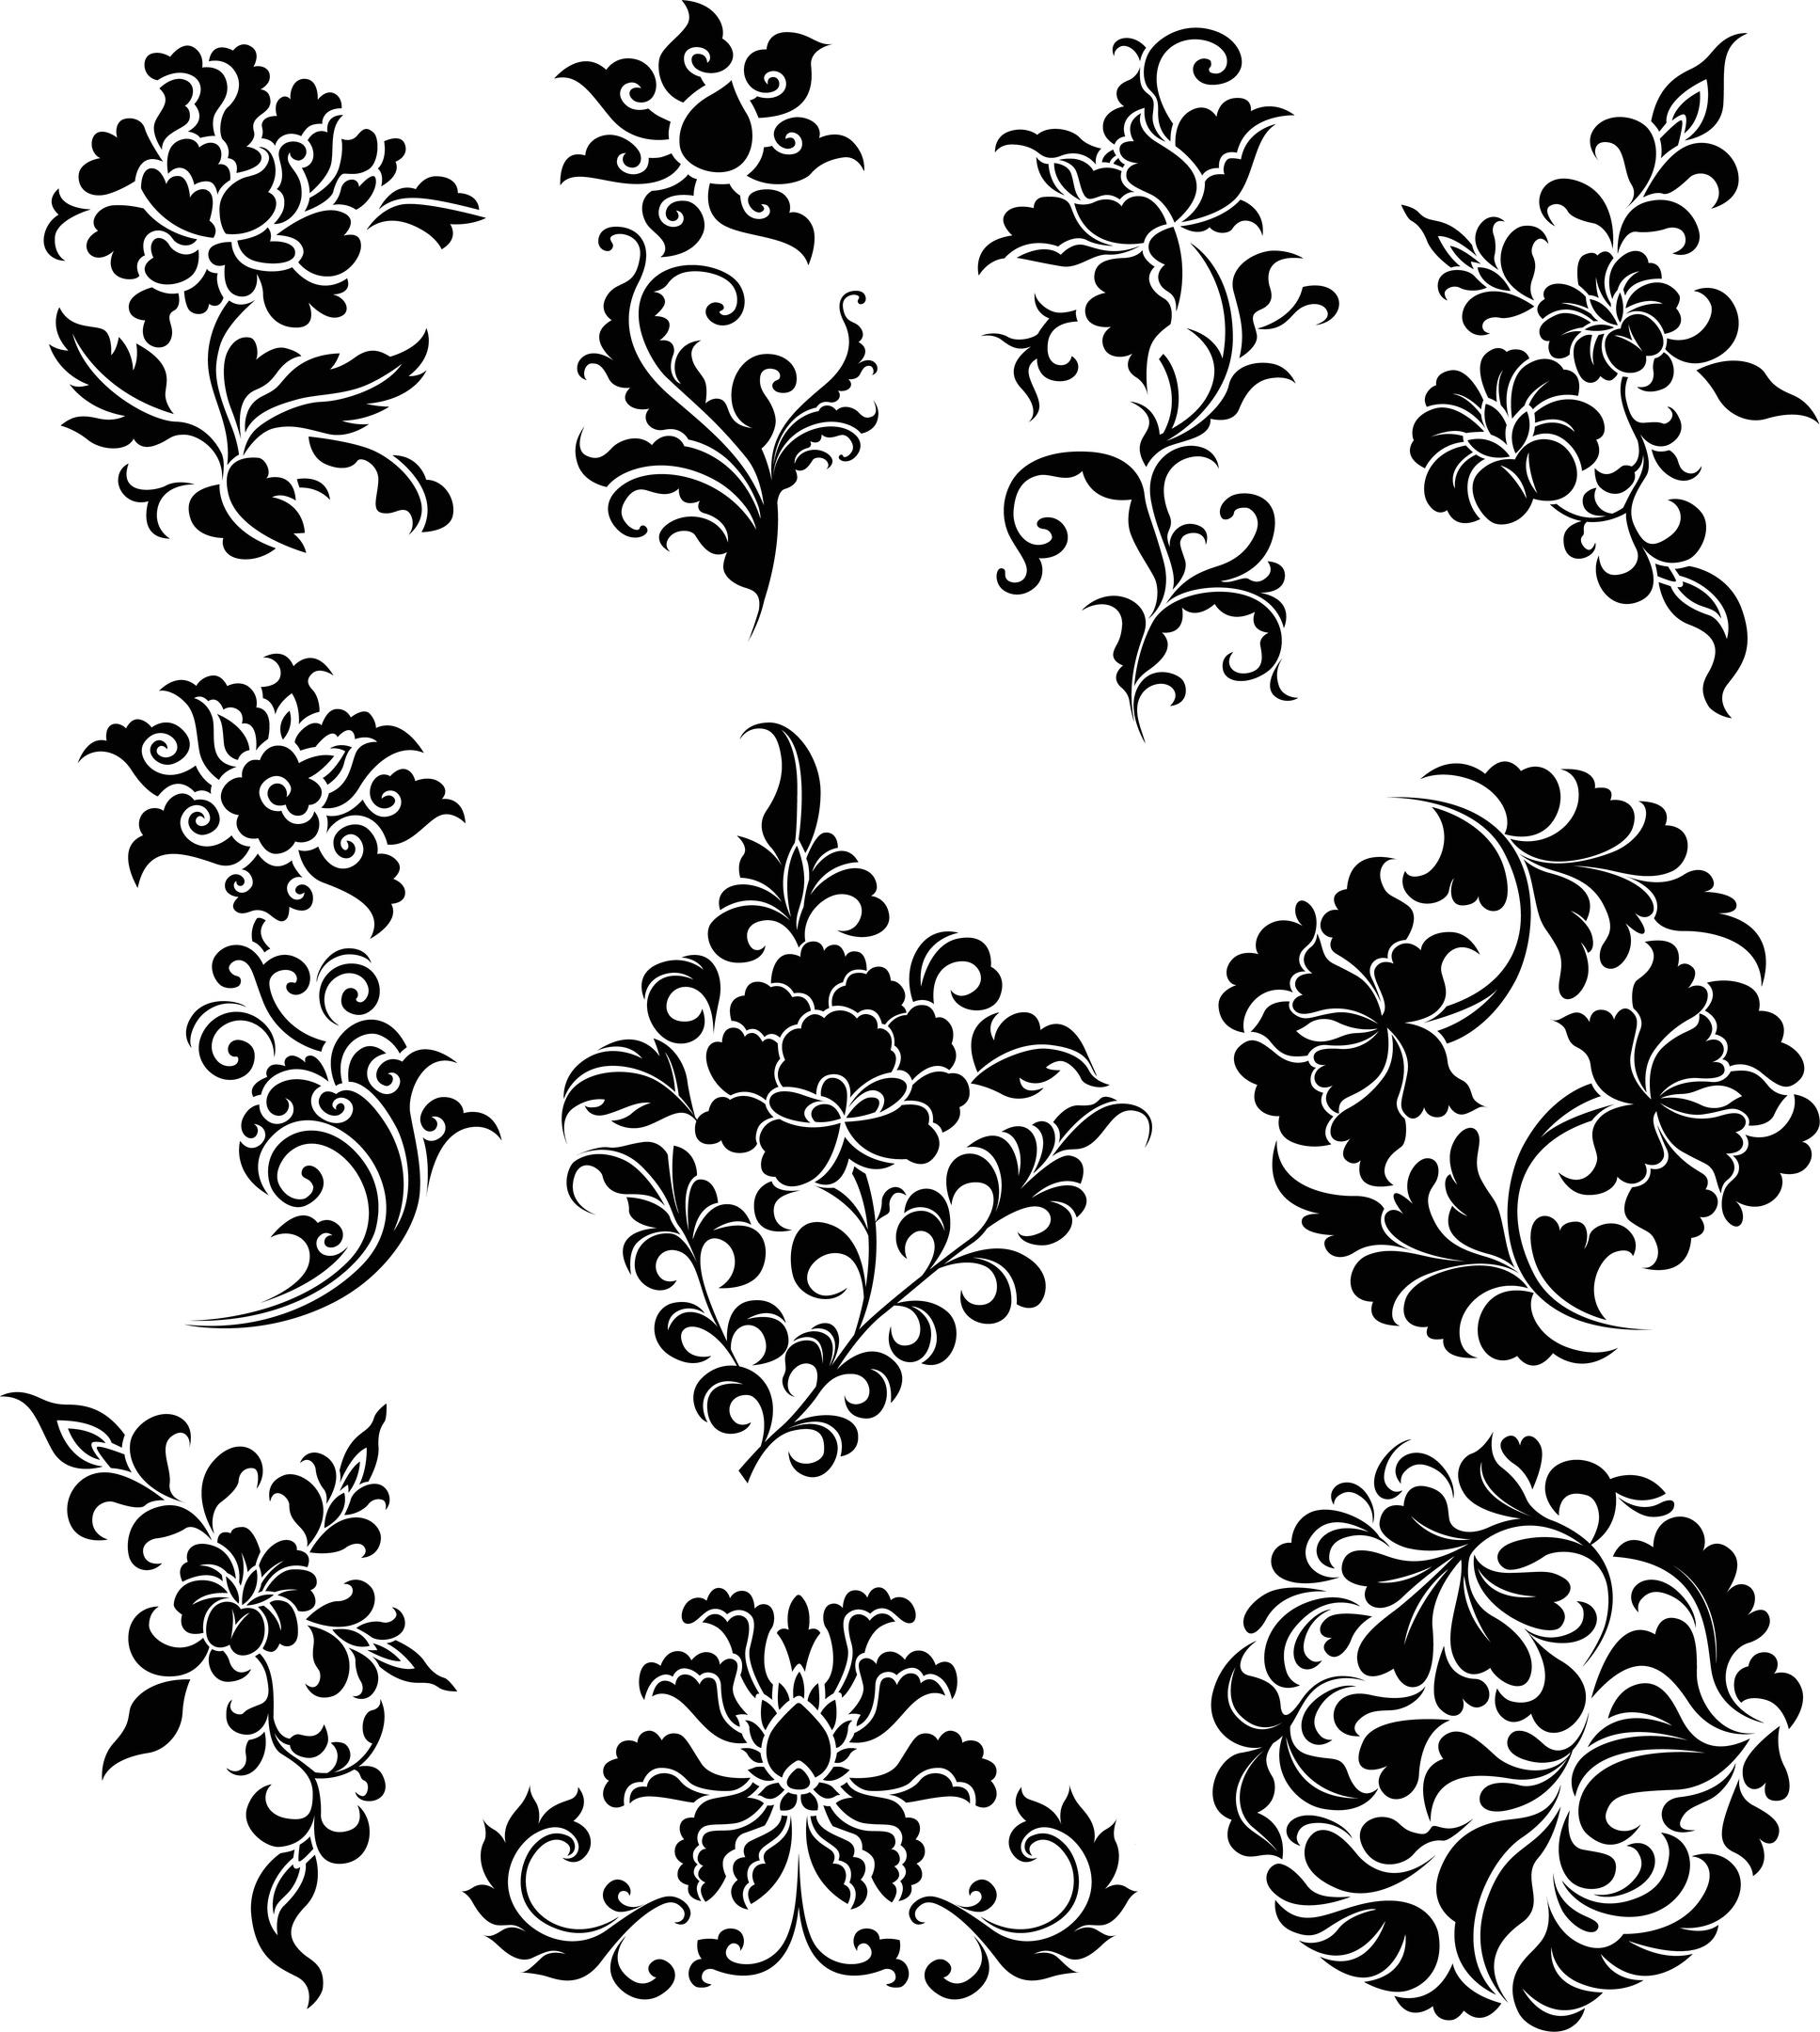 Vintage Ornamental Design Elements: Flowers Ornaments Illustration (.ai) Vector File Free